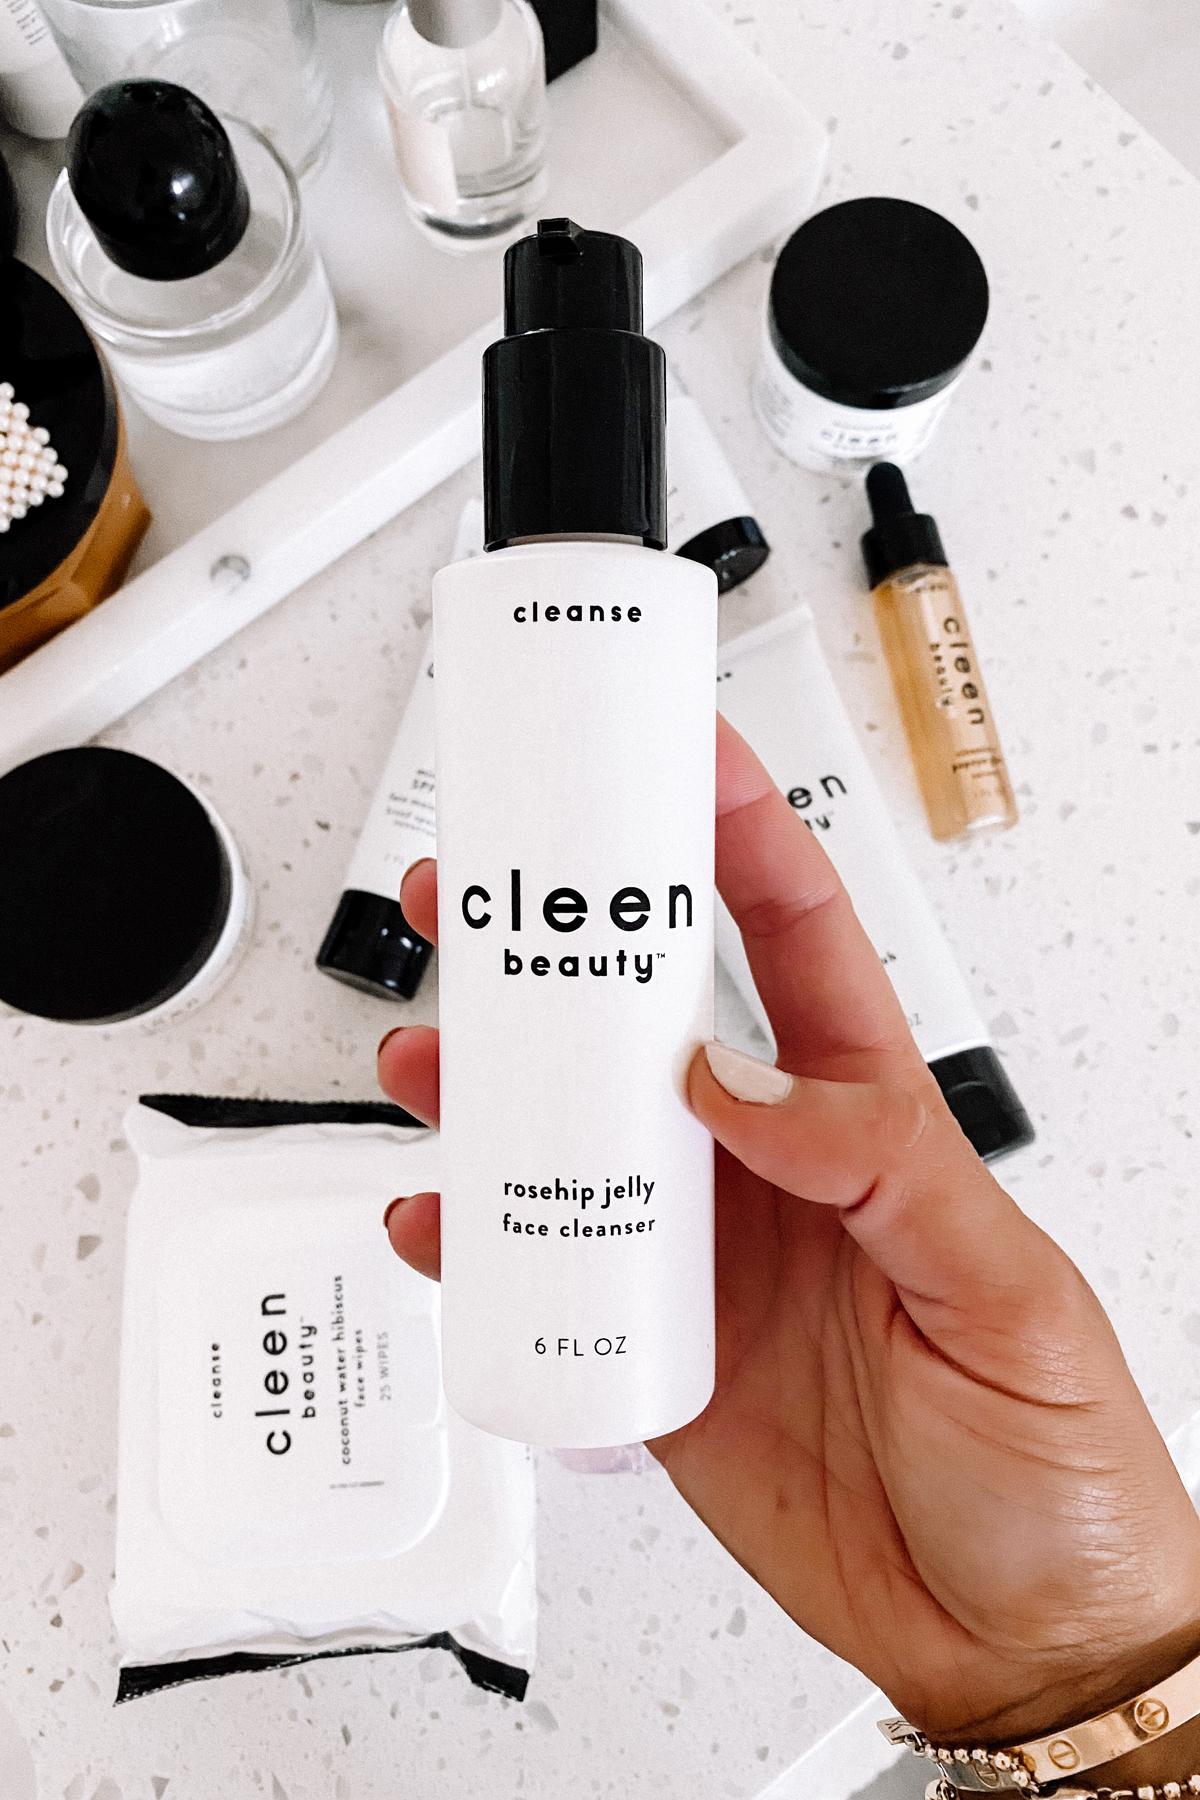 Fashion Jackson Walmart Beauty Cleen Beauty Face Cleanser